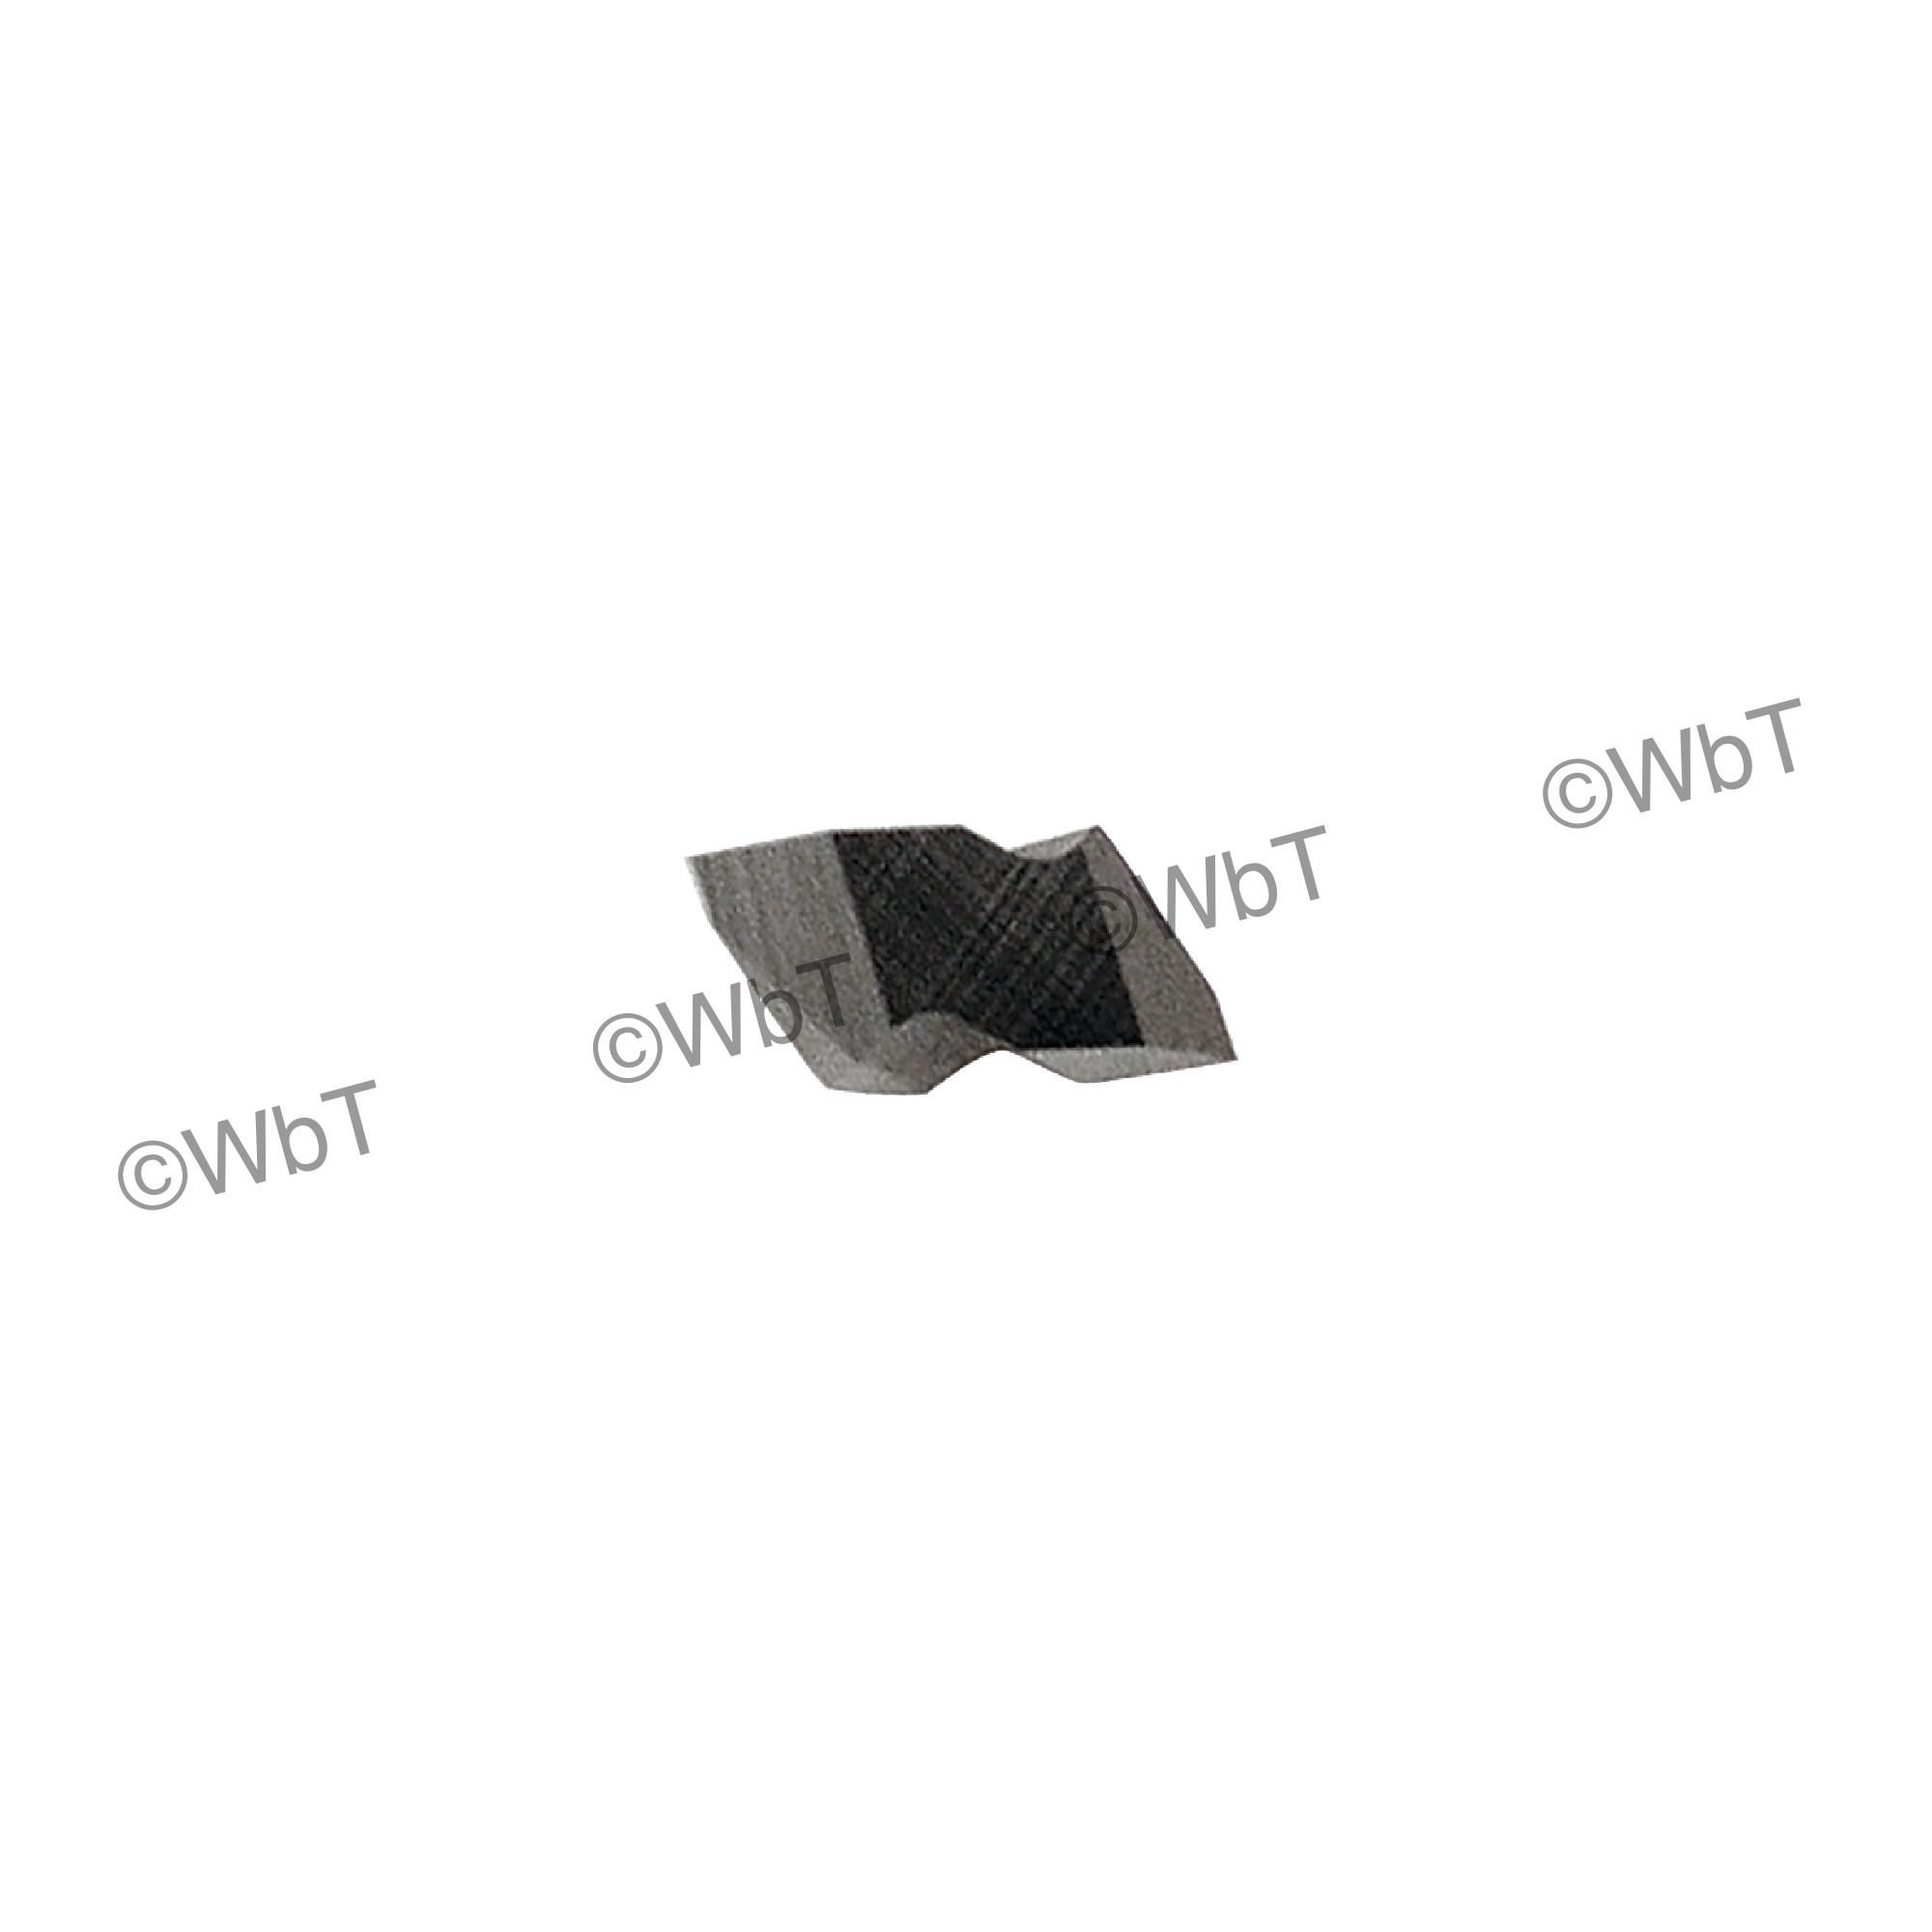 TERRA CARBIDE - TNT2R APC2 / Top Clamp INDEXABLE CARBIDE THREADING INSERT / 60°  V-THREADING / Right Hand